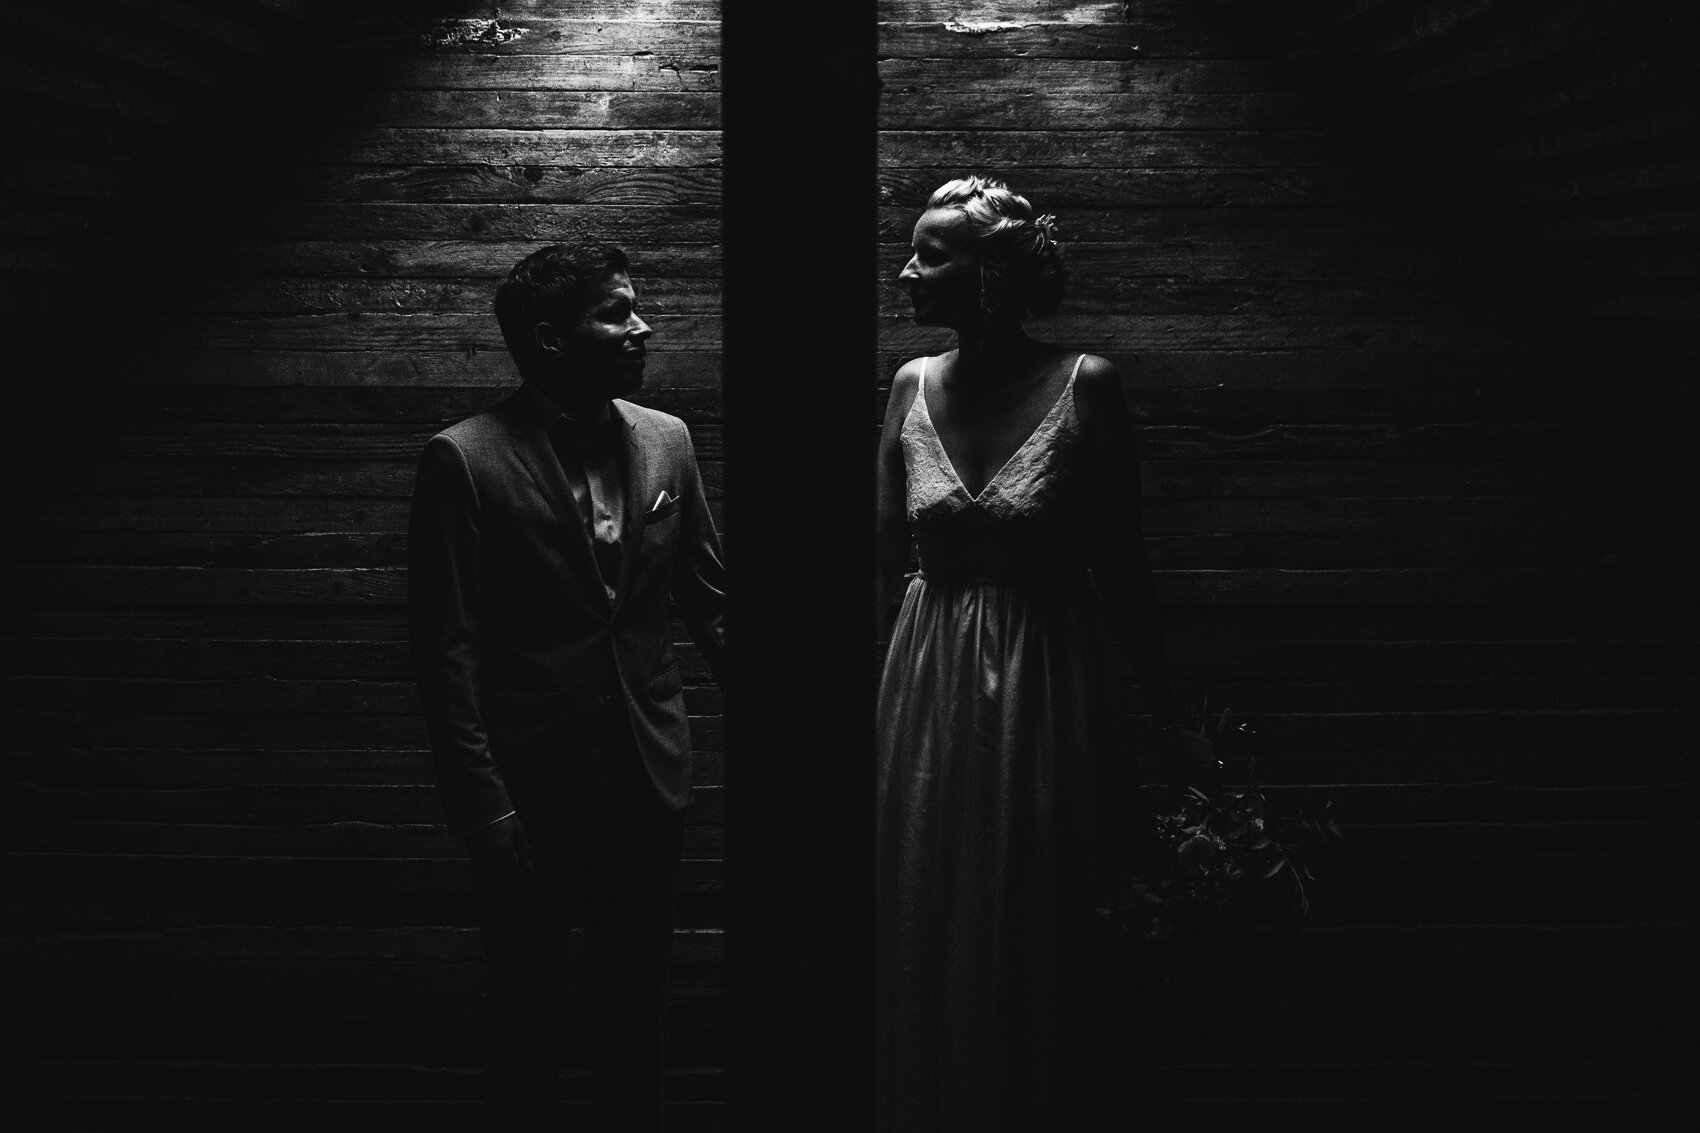 iso800 - huwelijksfotograaf isabo matthias verbeke foundation-9.jpg